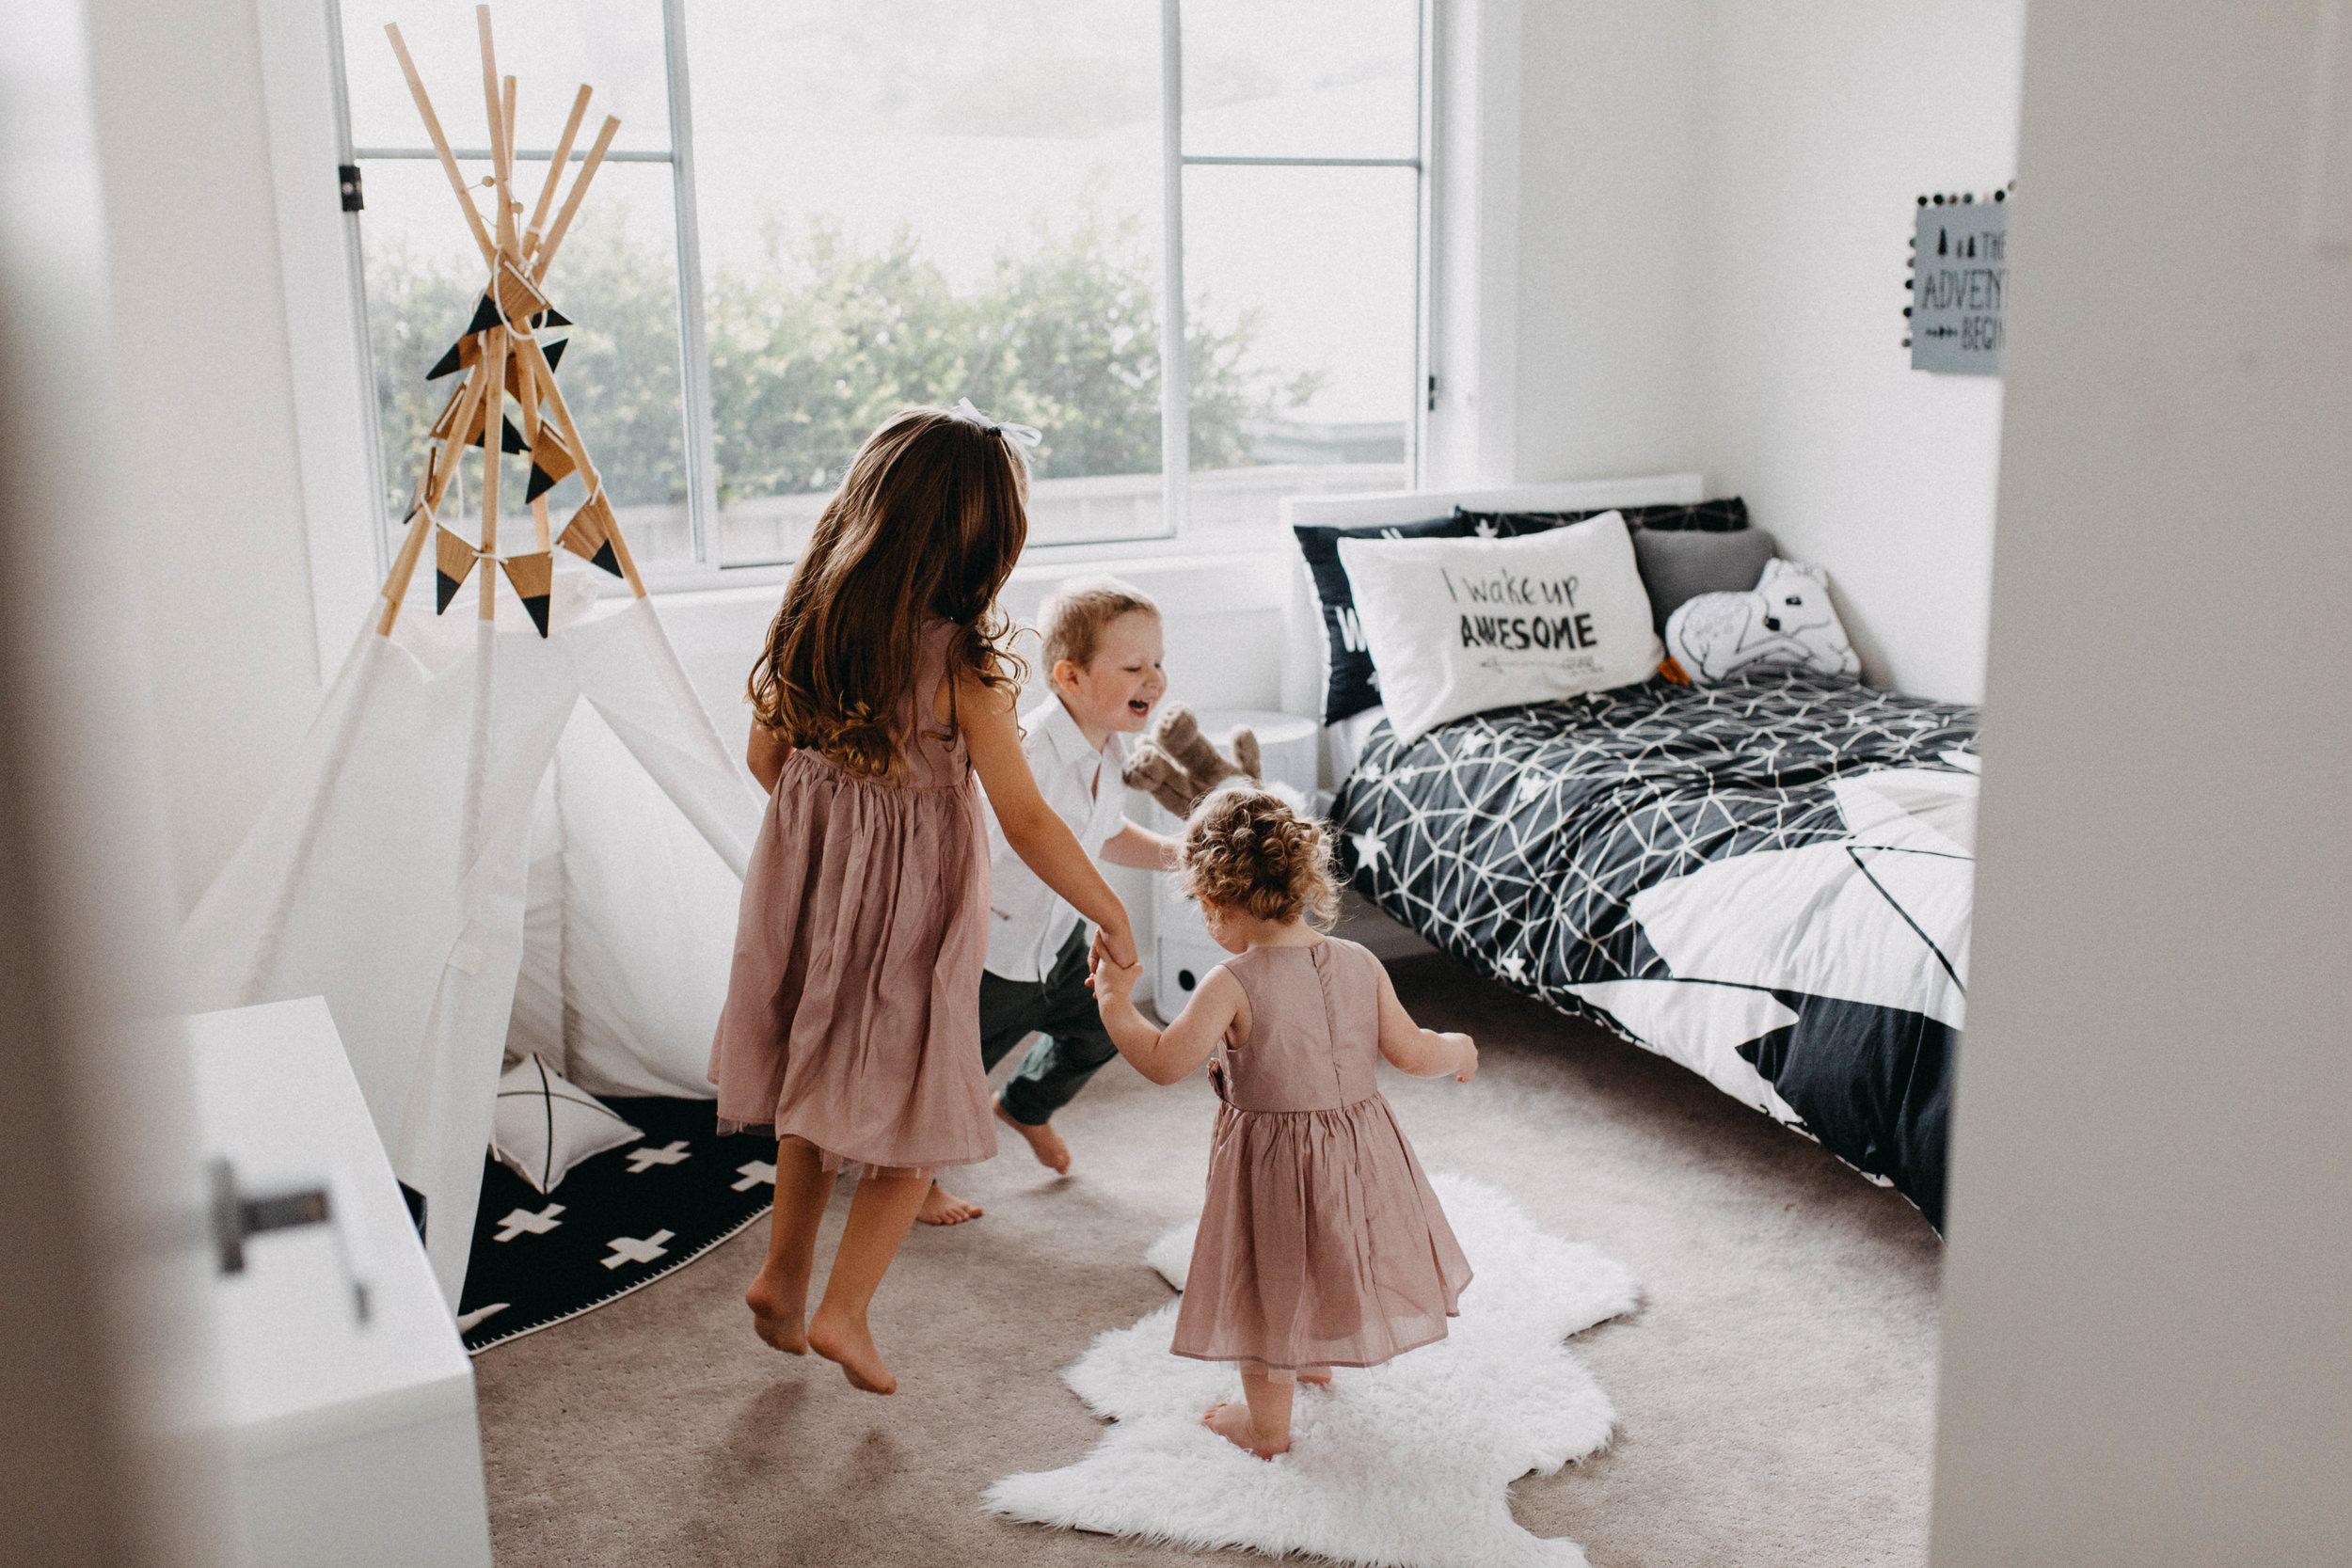 lifestye-family-photography-macarthur-emily-obrien-photography-6.jpg